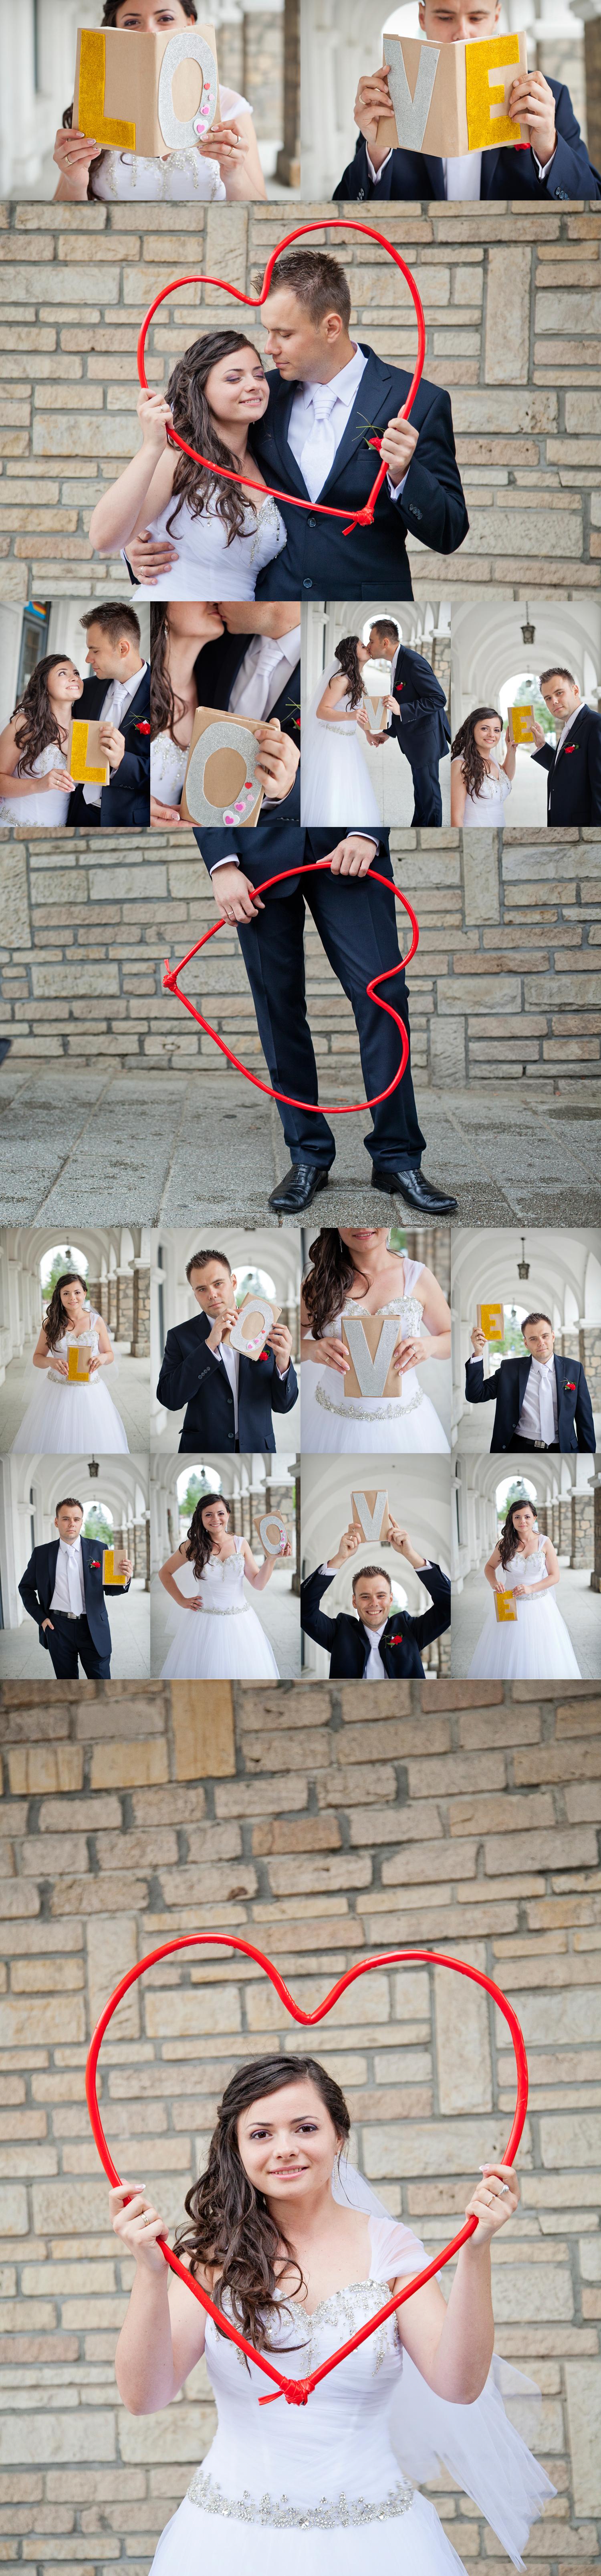 Plener ślubny Gorlice